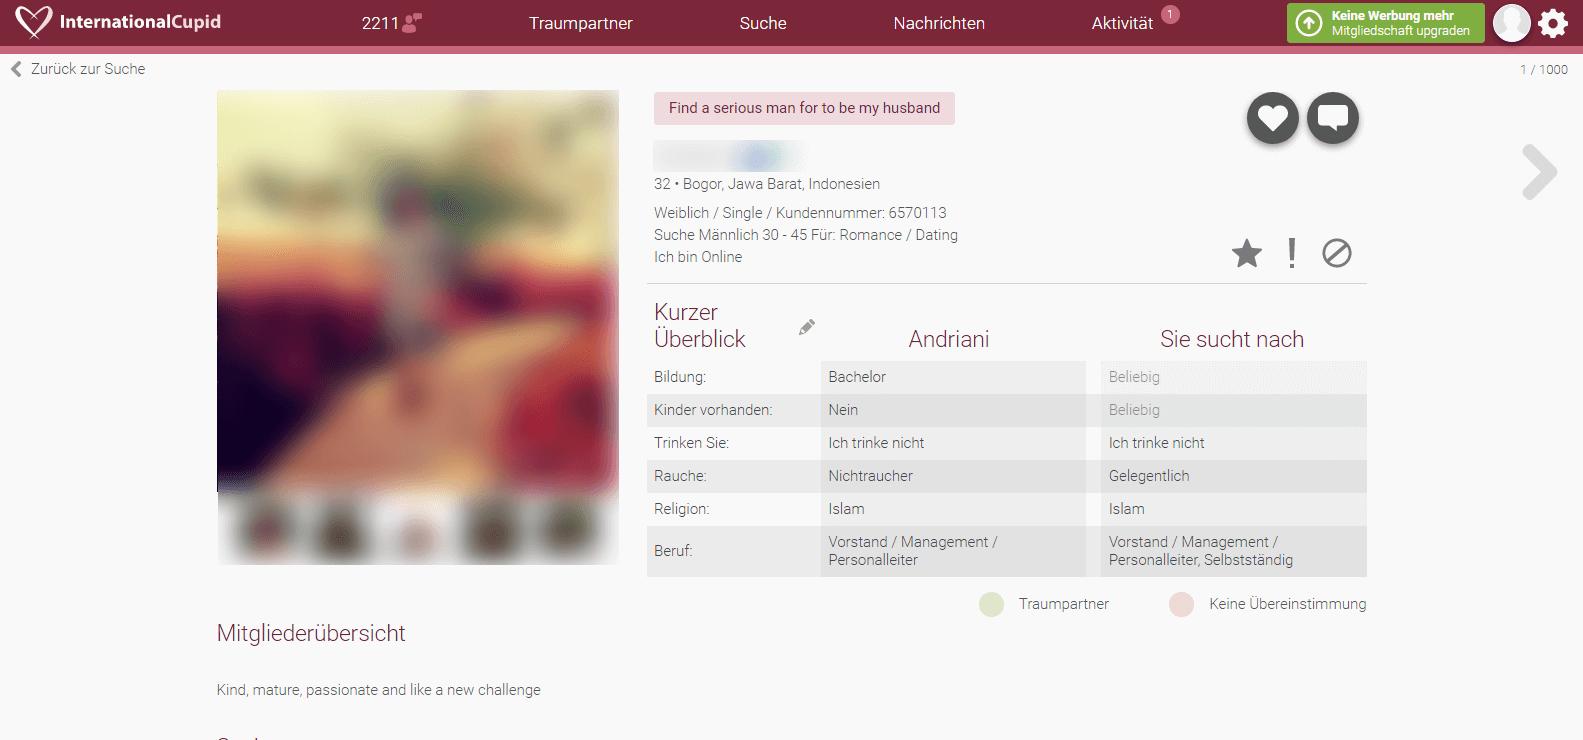 InternationalCupid Profile